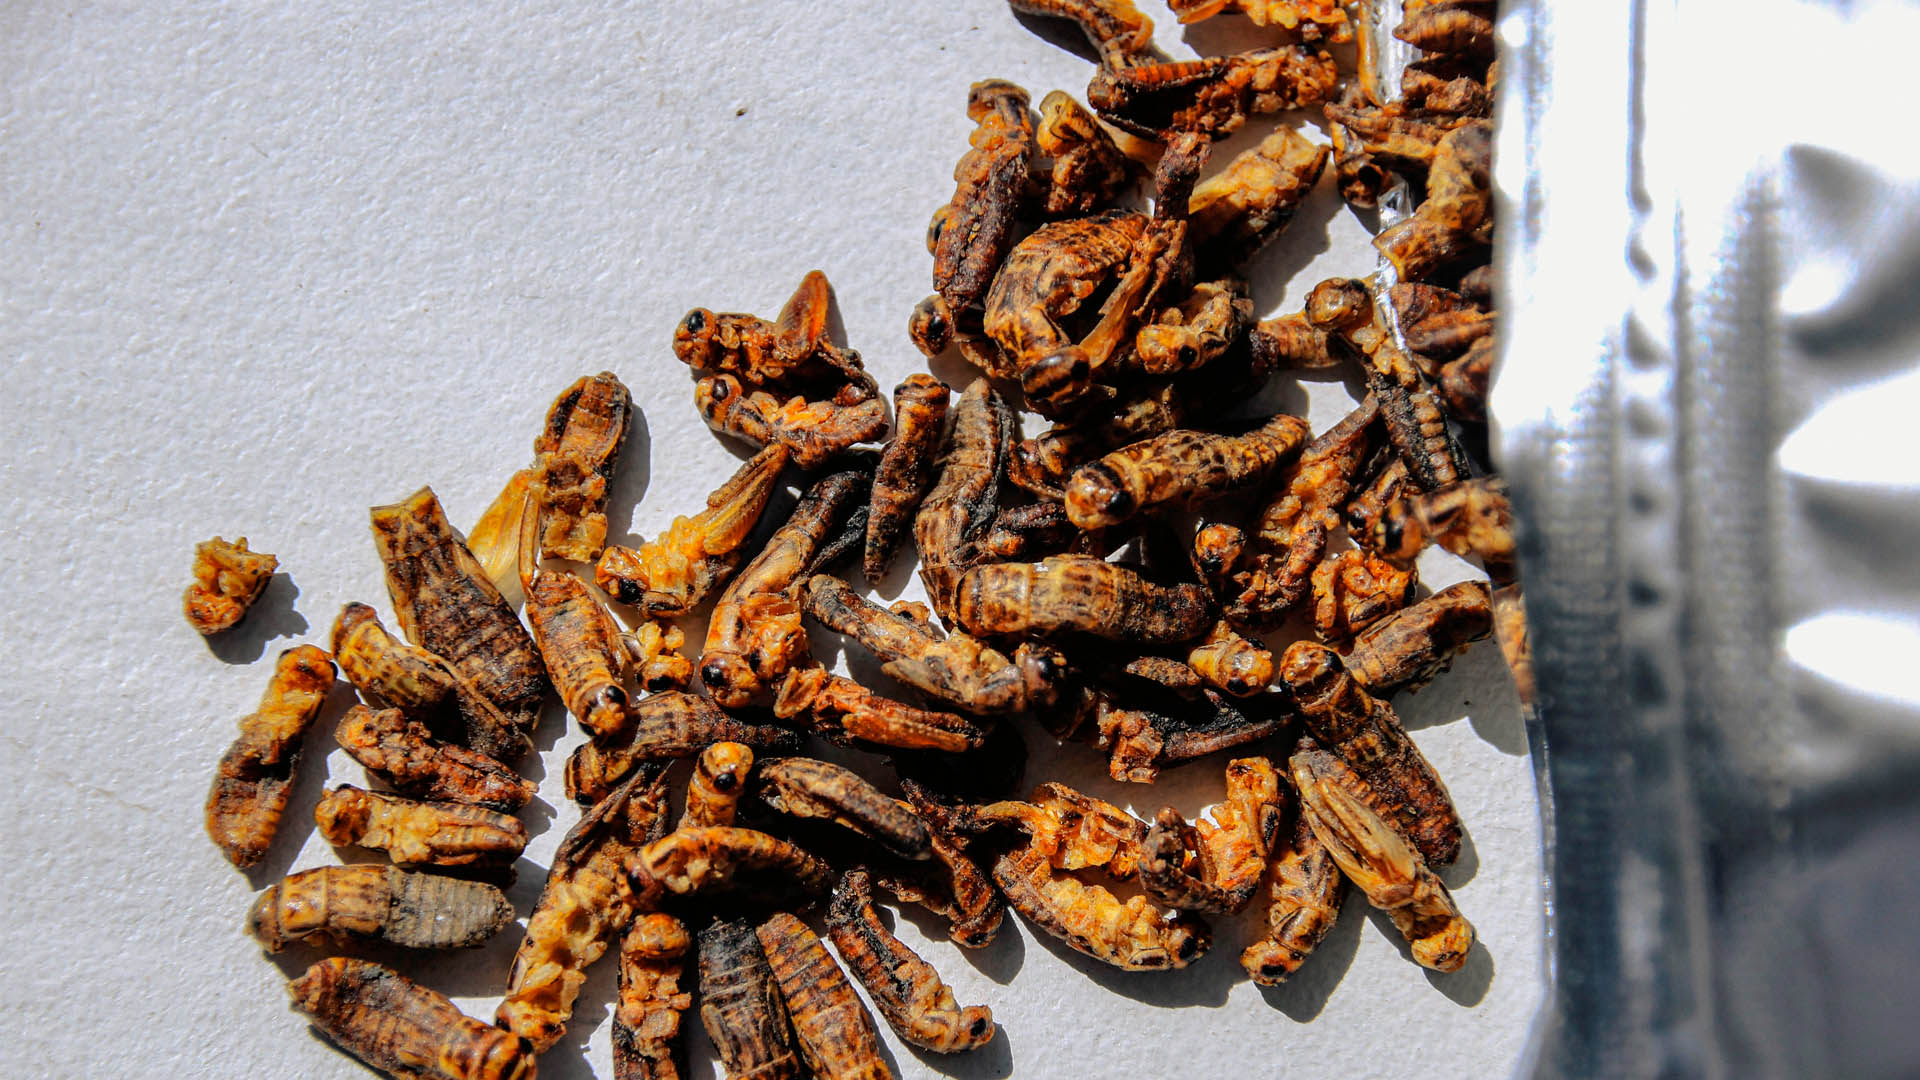 Insectos comida alimentos 2